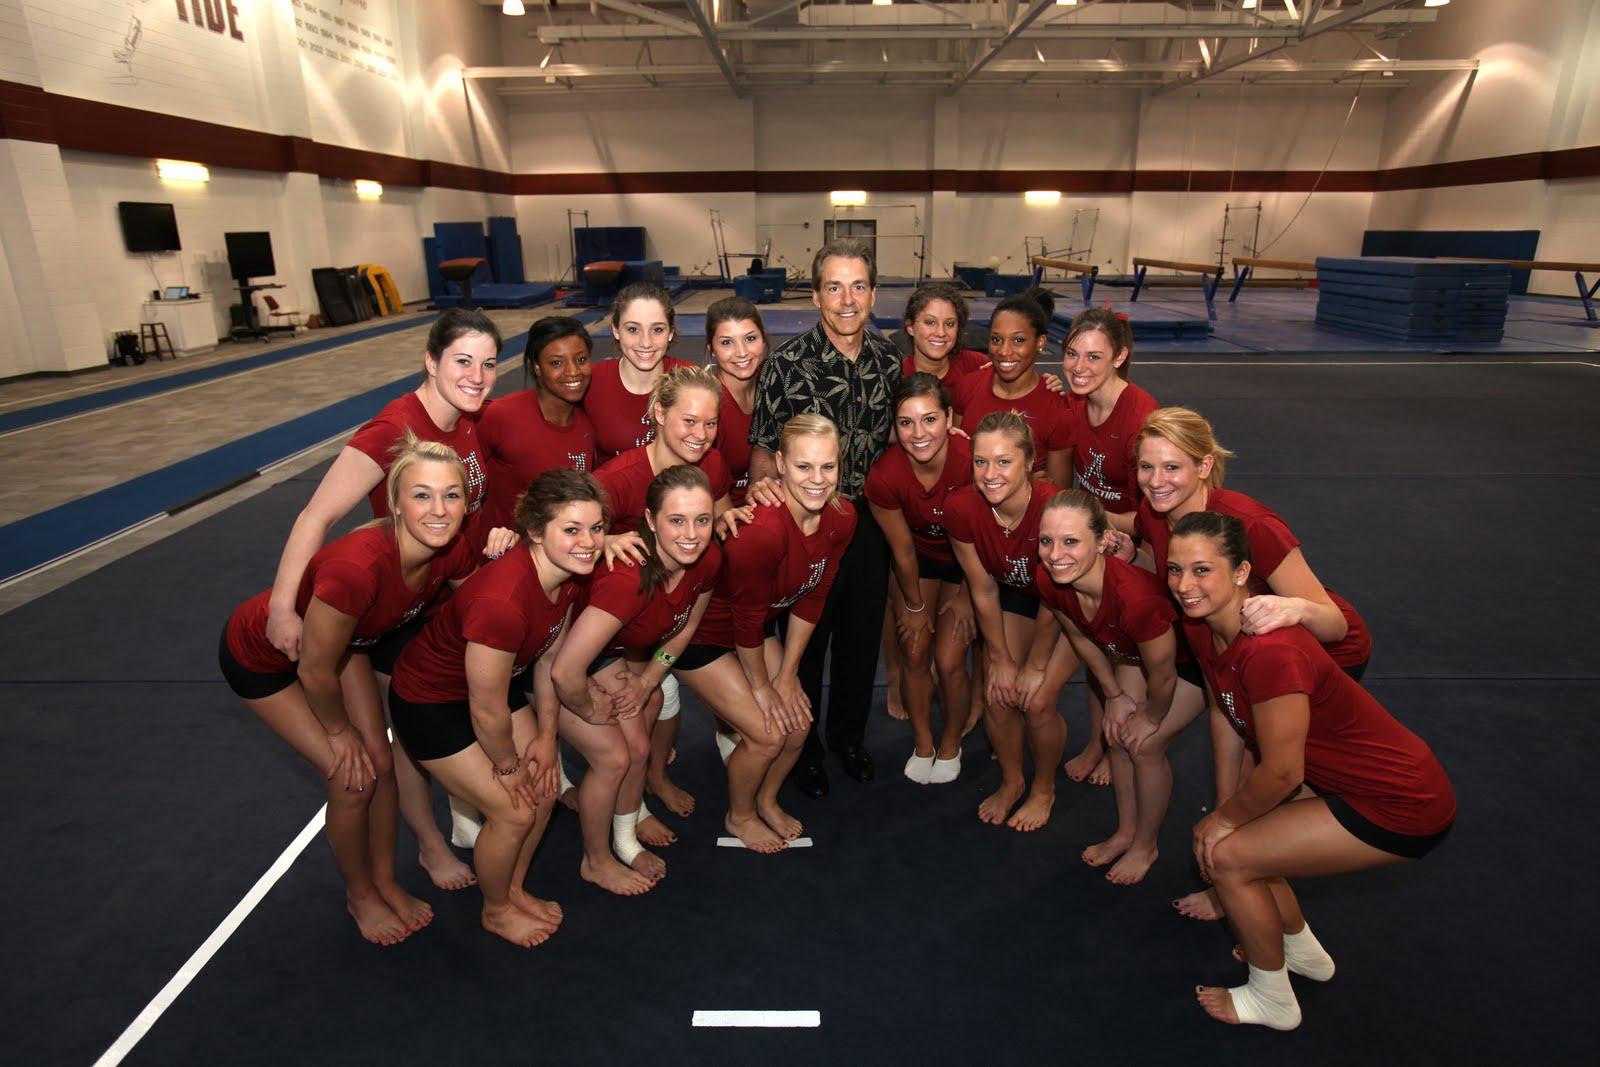 Nick Saban Visits the NCAA Regional Champion Alabama Gymnastics Team